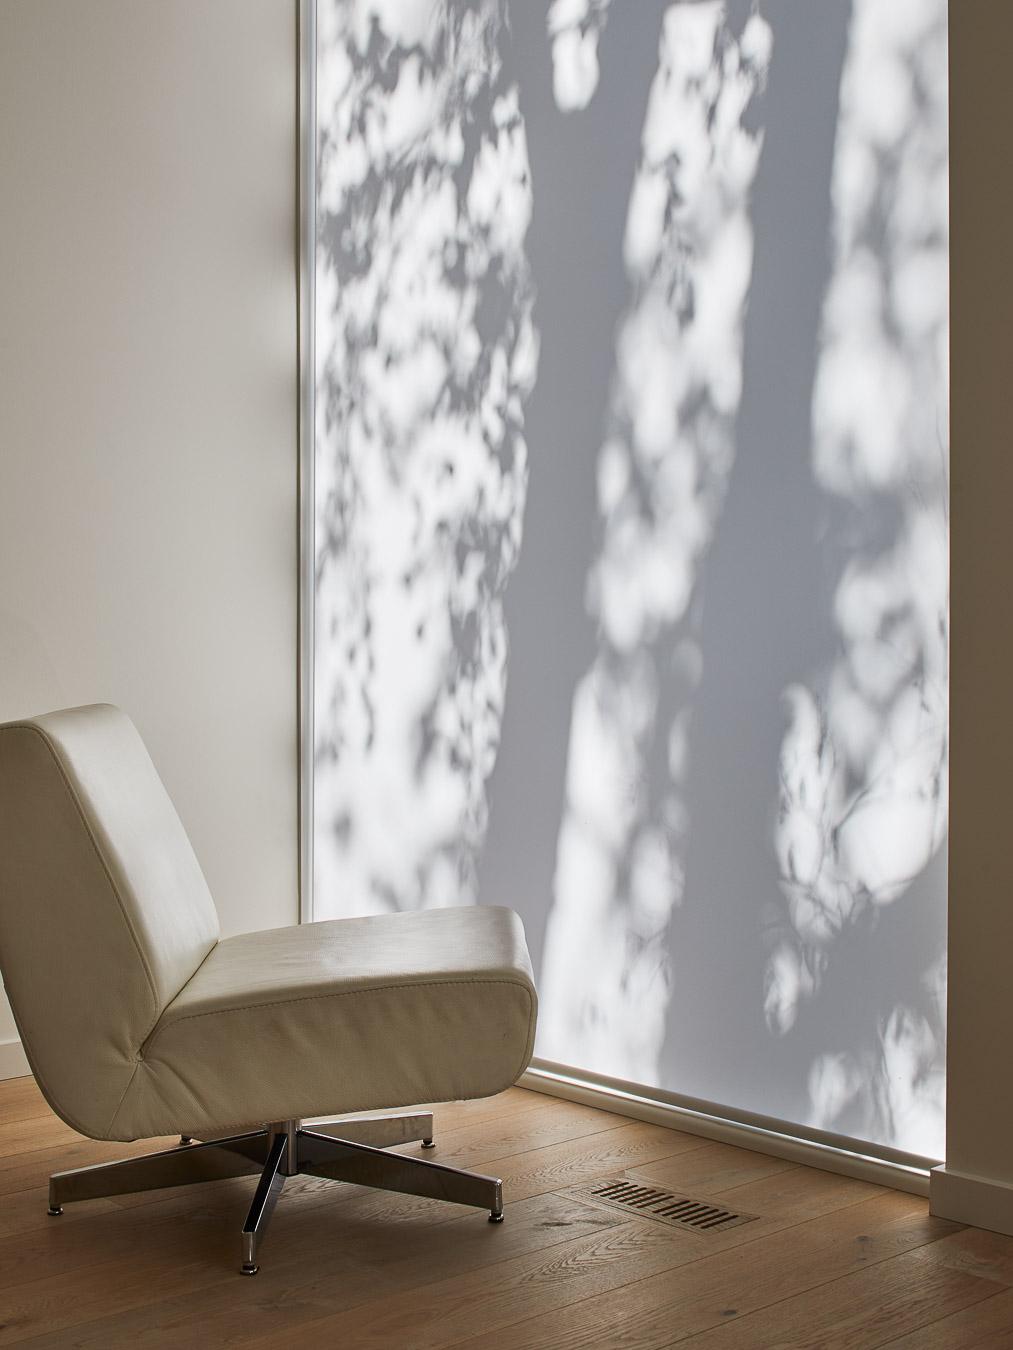 014-Shean Architects Fentiman.jpg